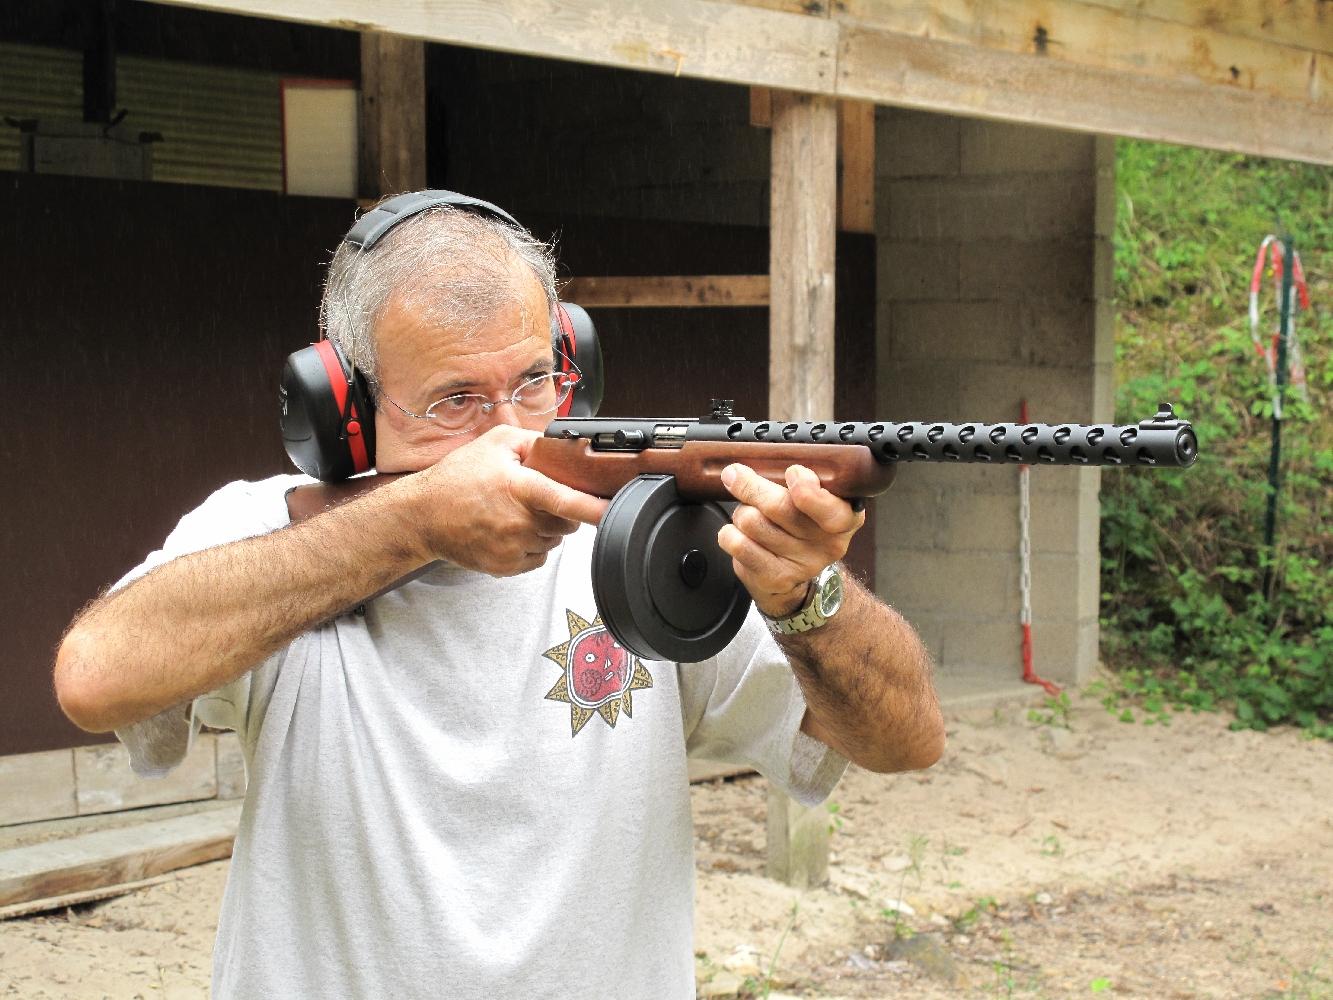 essai armes carabine pietta pps 50 calibre 22 long rifle. Black Bedroom Furniture Sets. Home Design Ideas